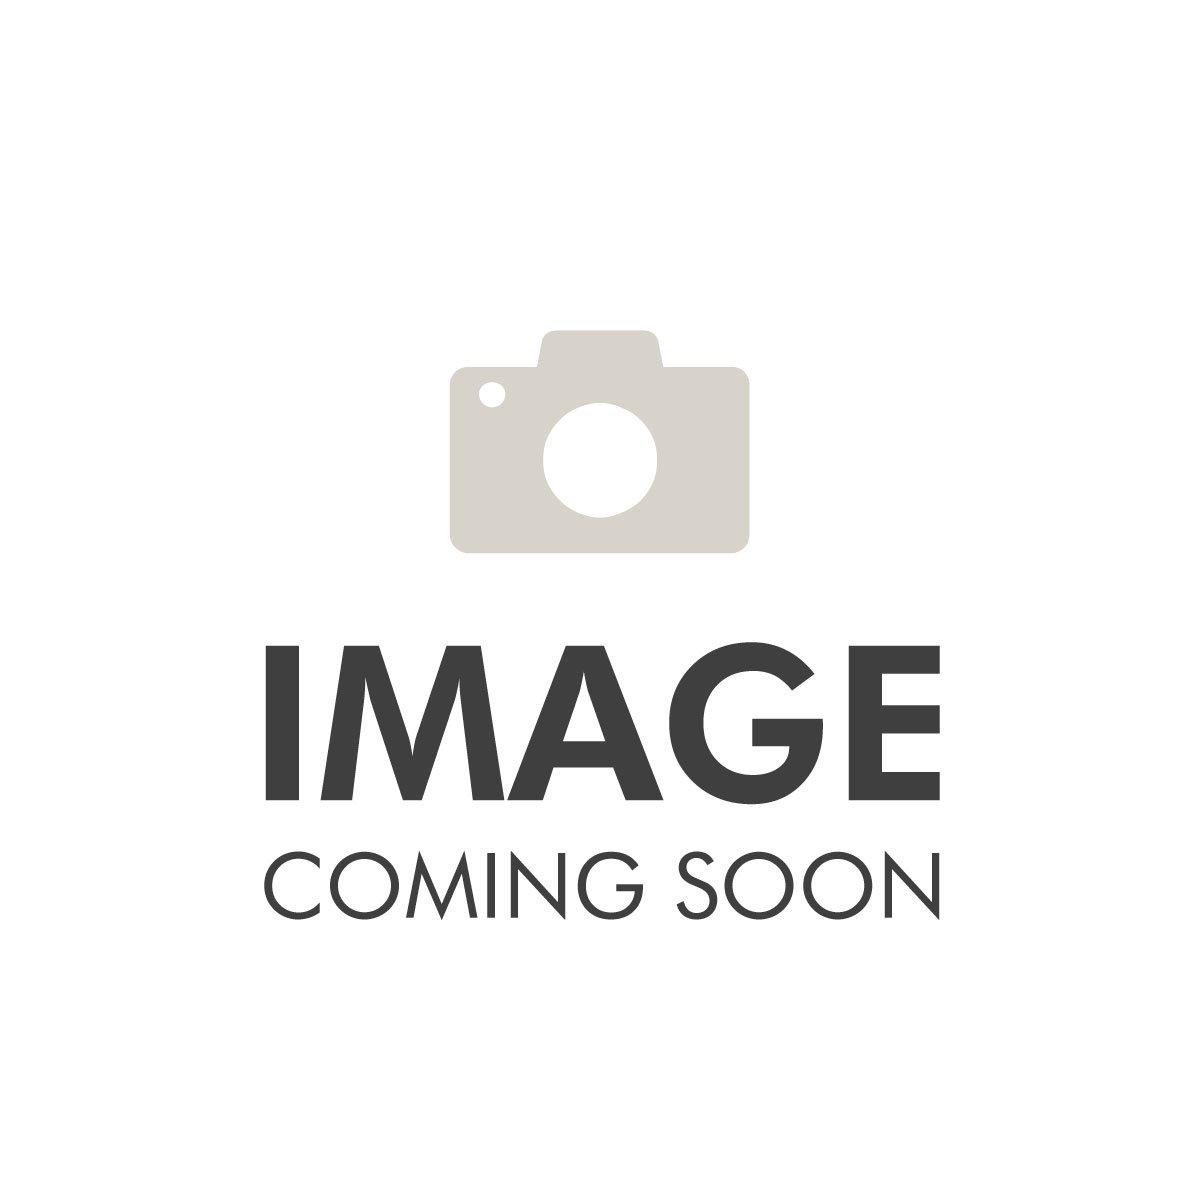 Thierry Mugler Angel Gift Set 25ml EDP + 100ml Body Lotion + 30ml Shower Gel